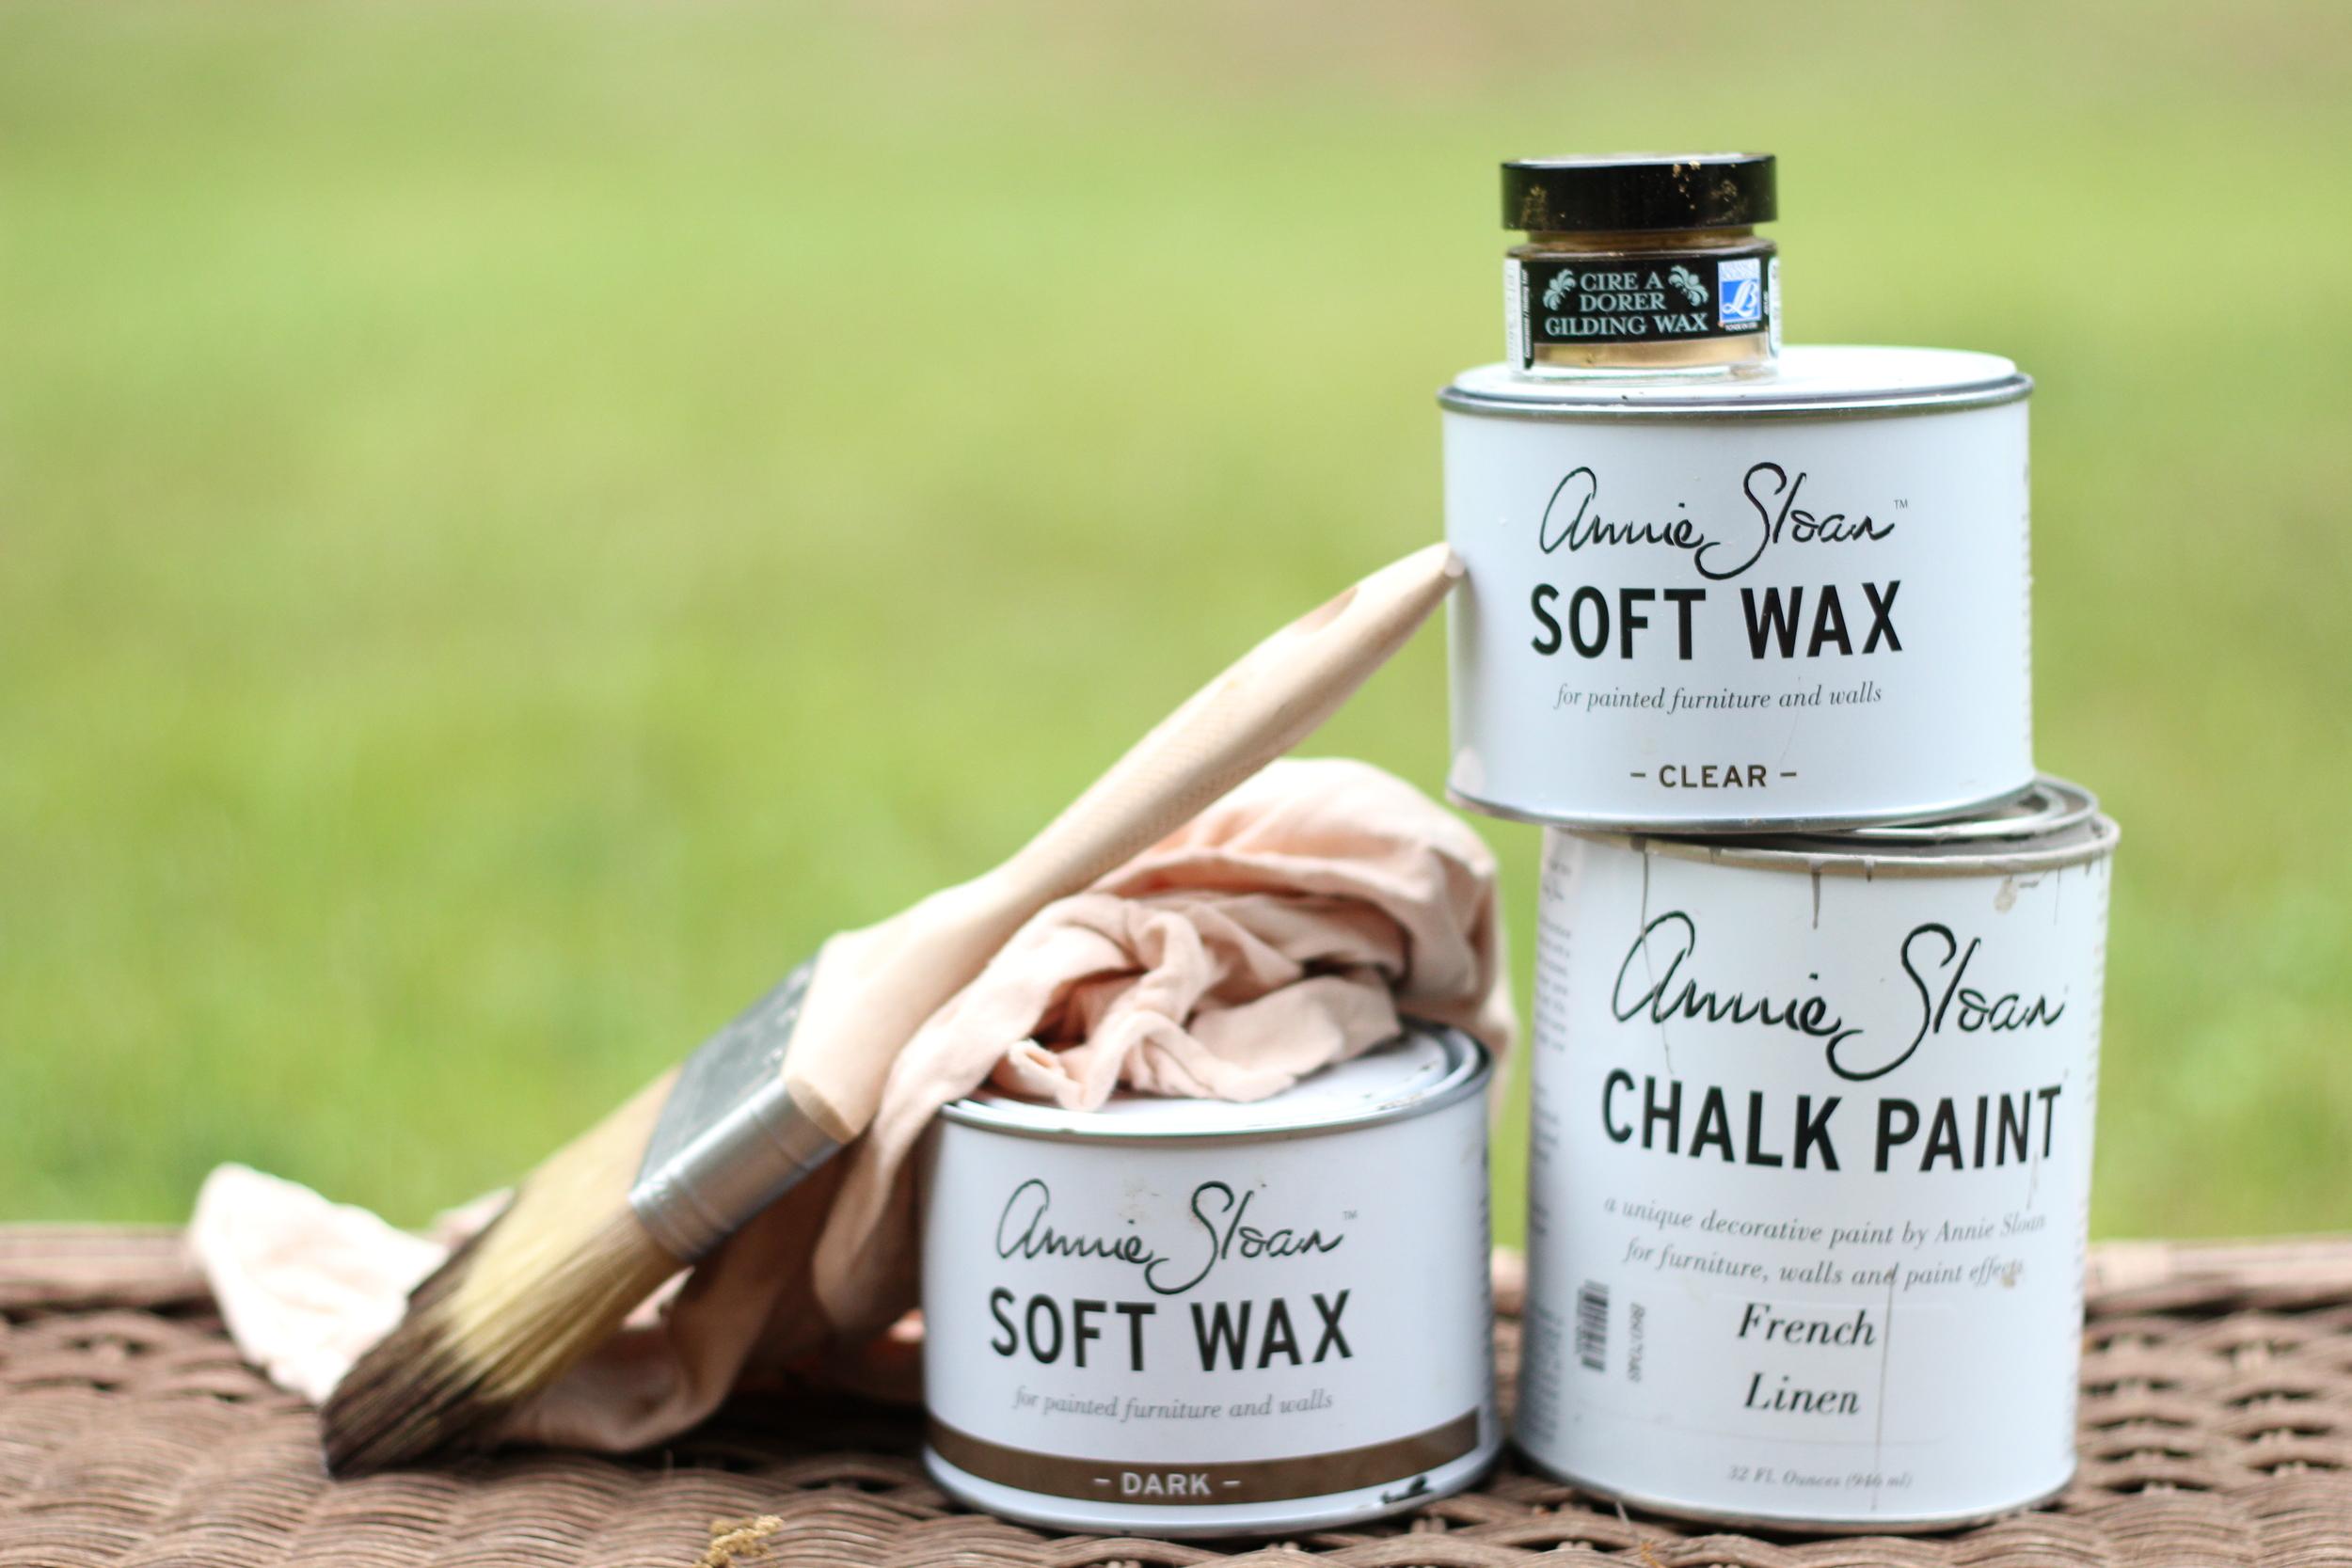 chalkpaint